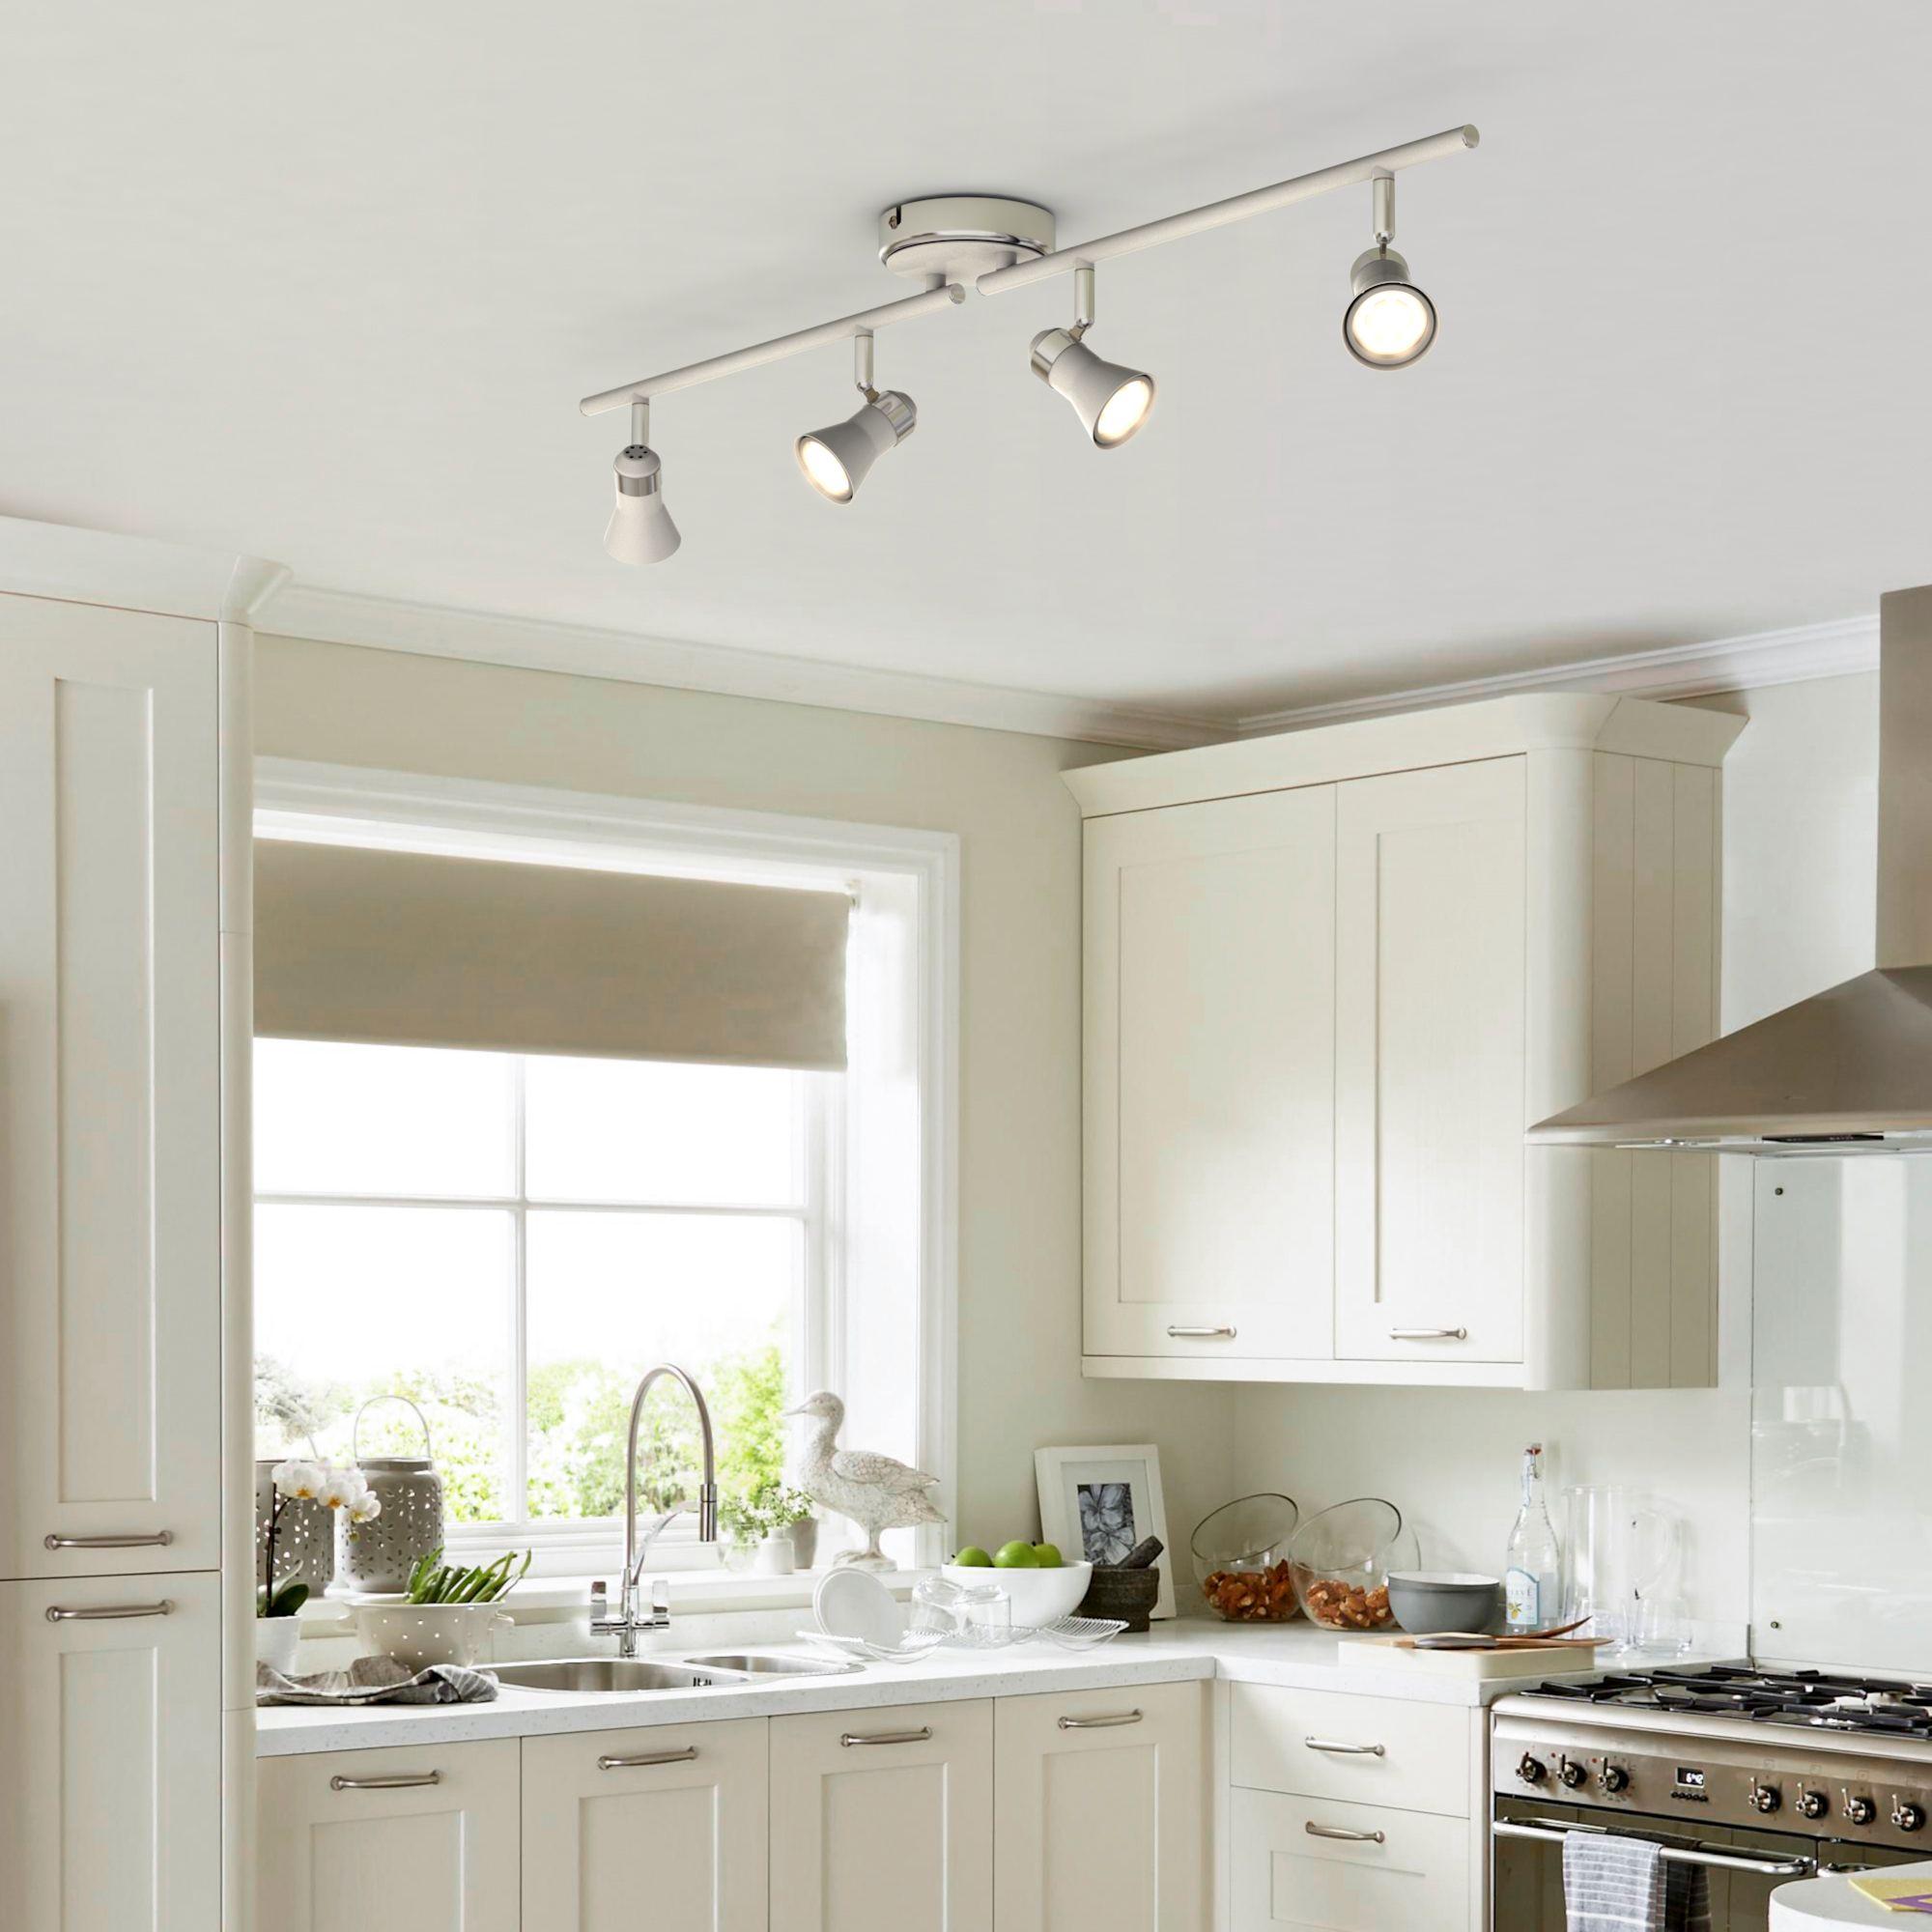 kitchen lights kitchen ceiling lights spotlights rh diy com kitchen ceiling lights led kitchen ceiling lighting